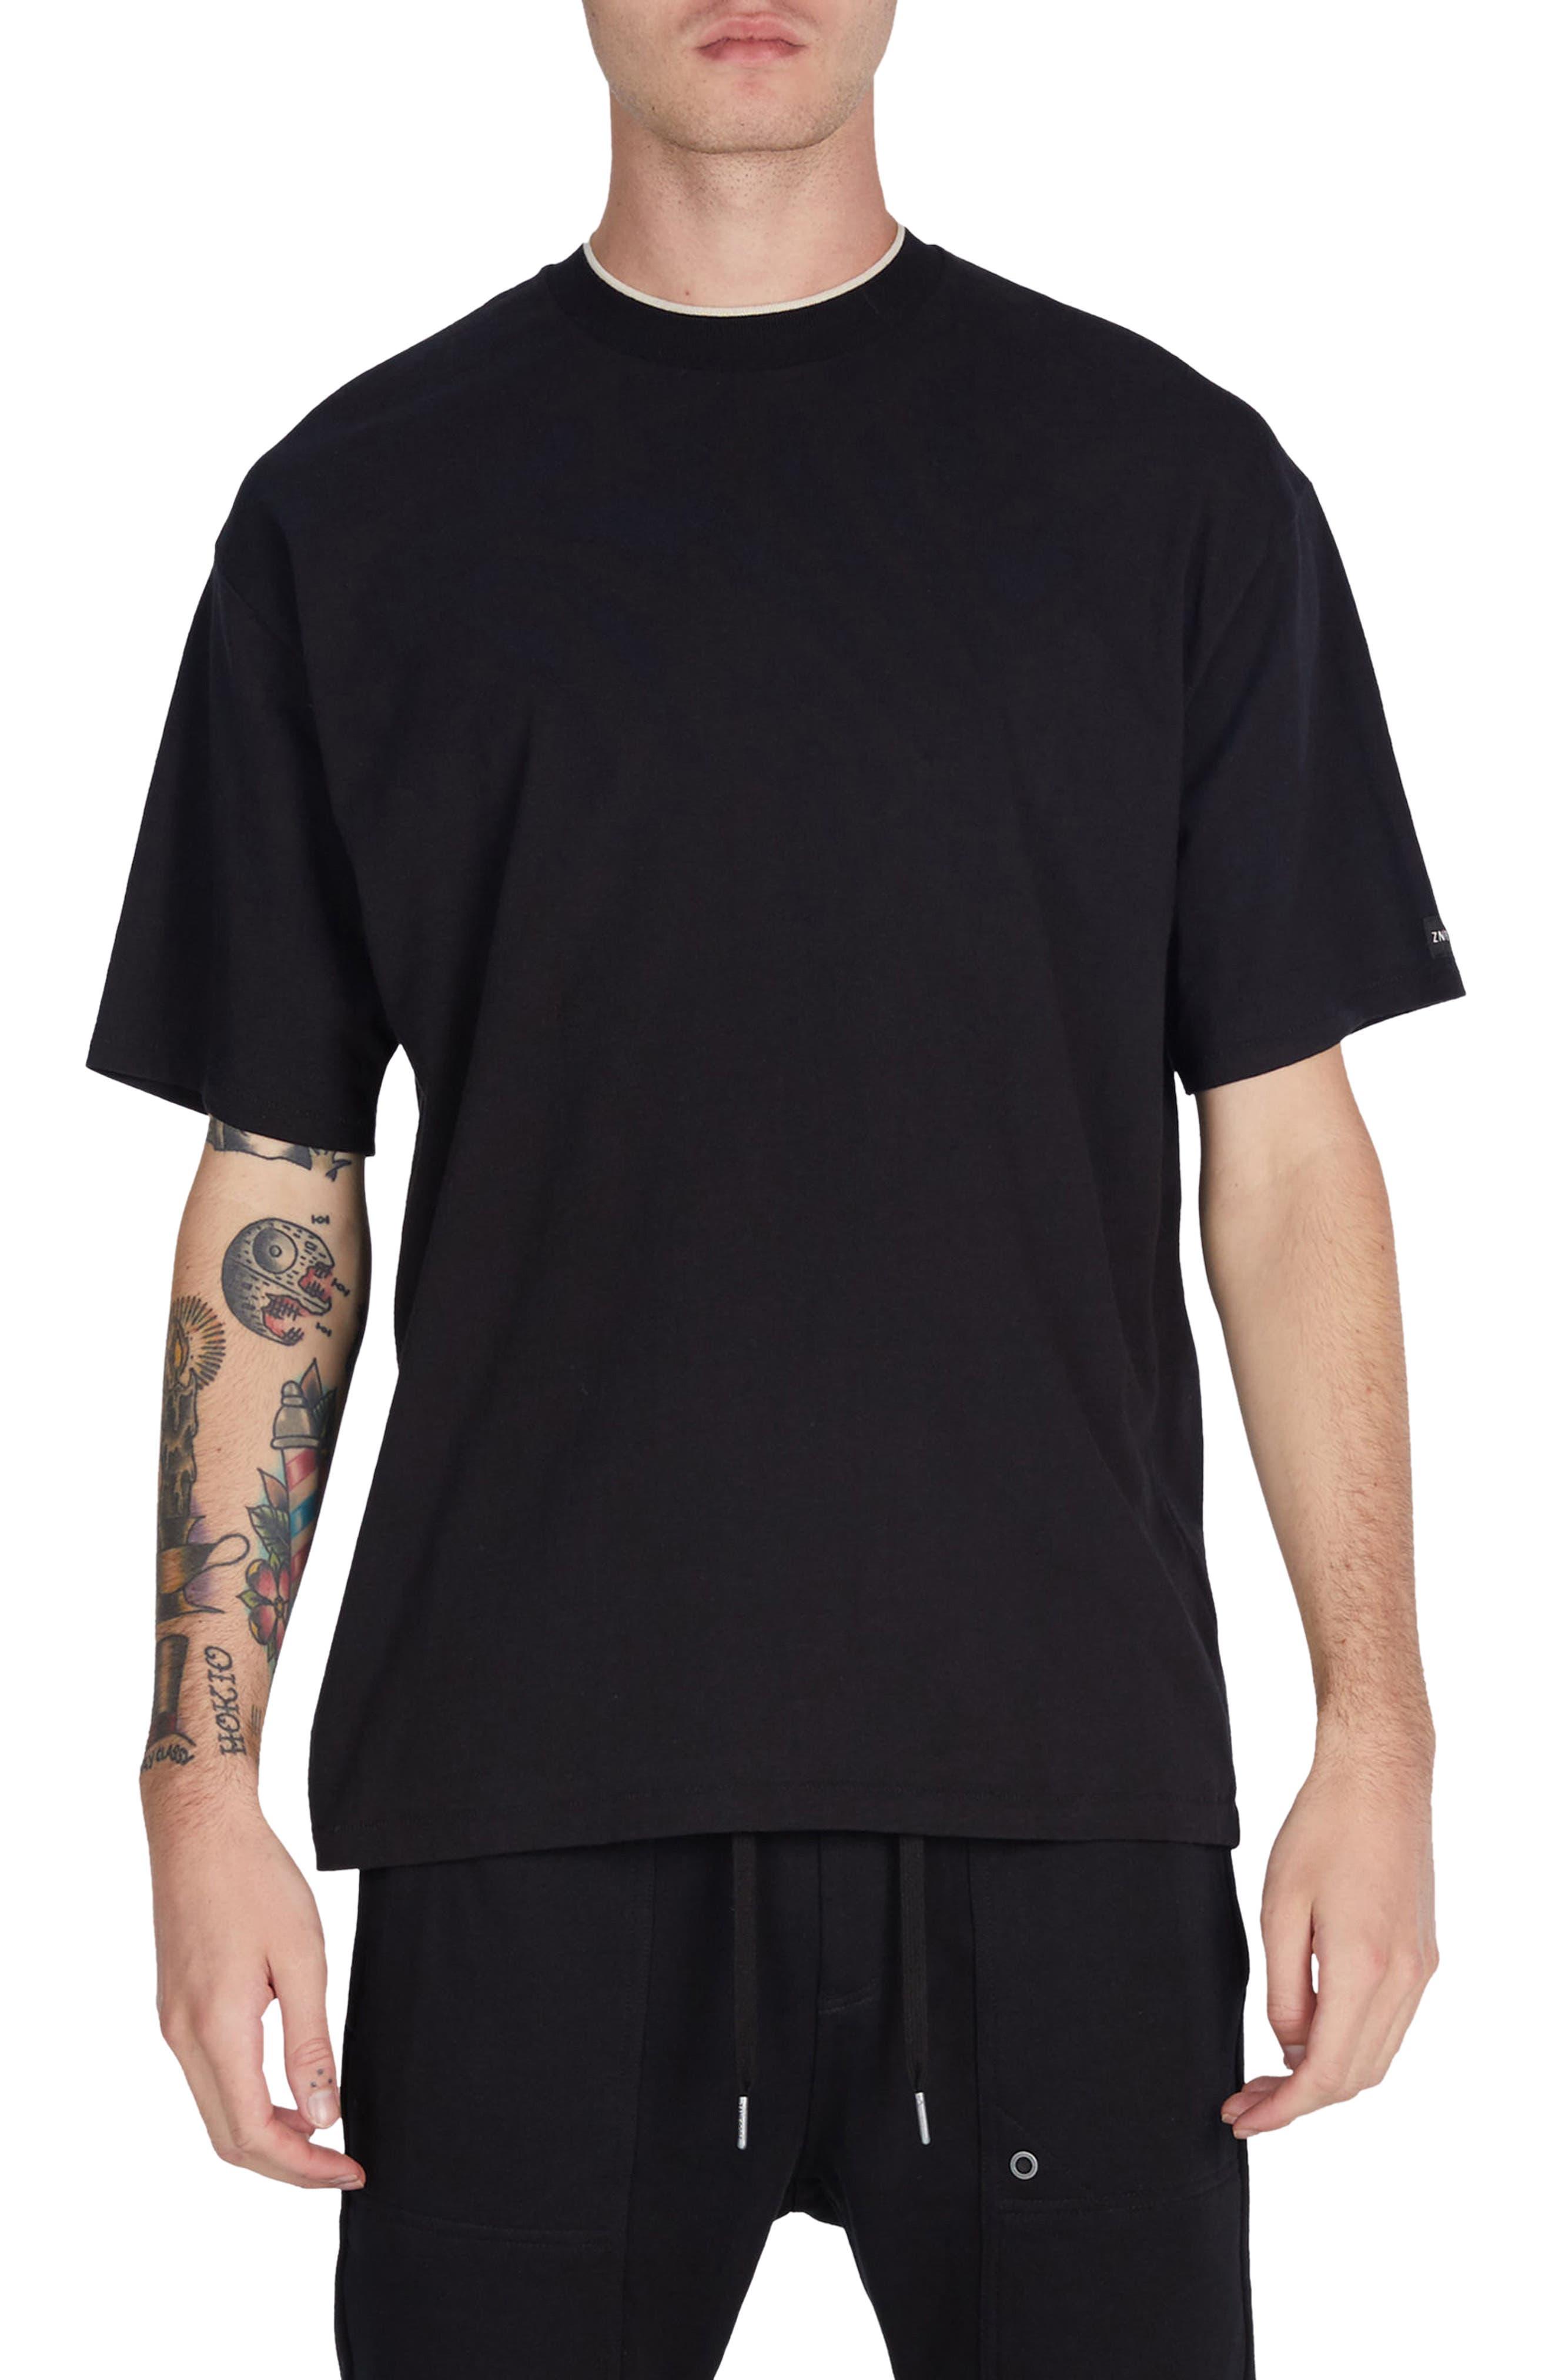 Tip Box T-Shirt,                             Main thumbnail 1, color,                             Black